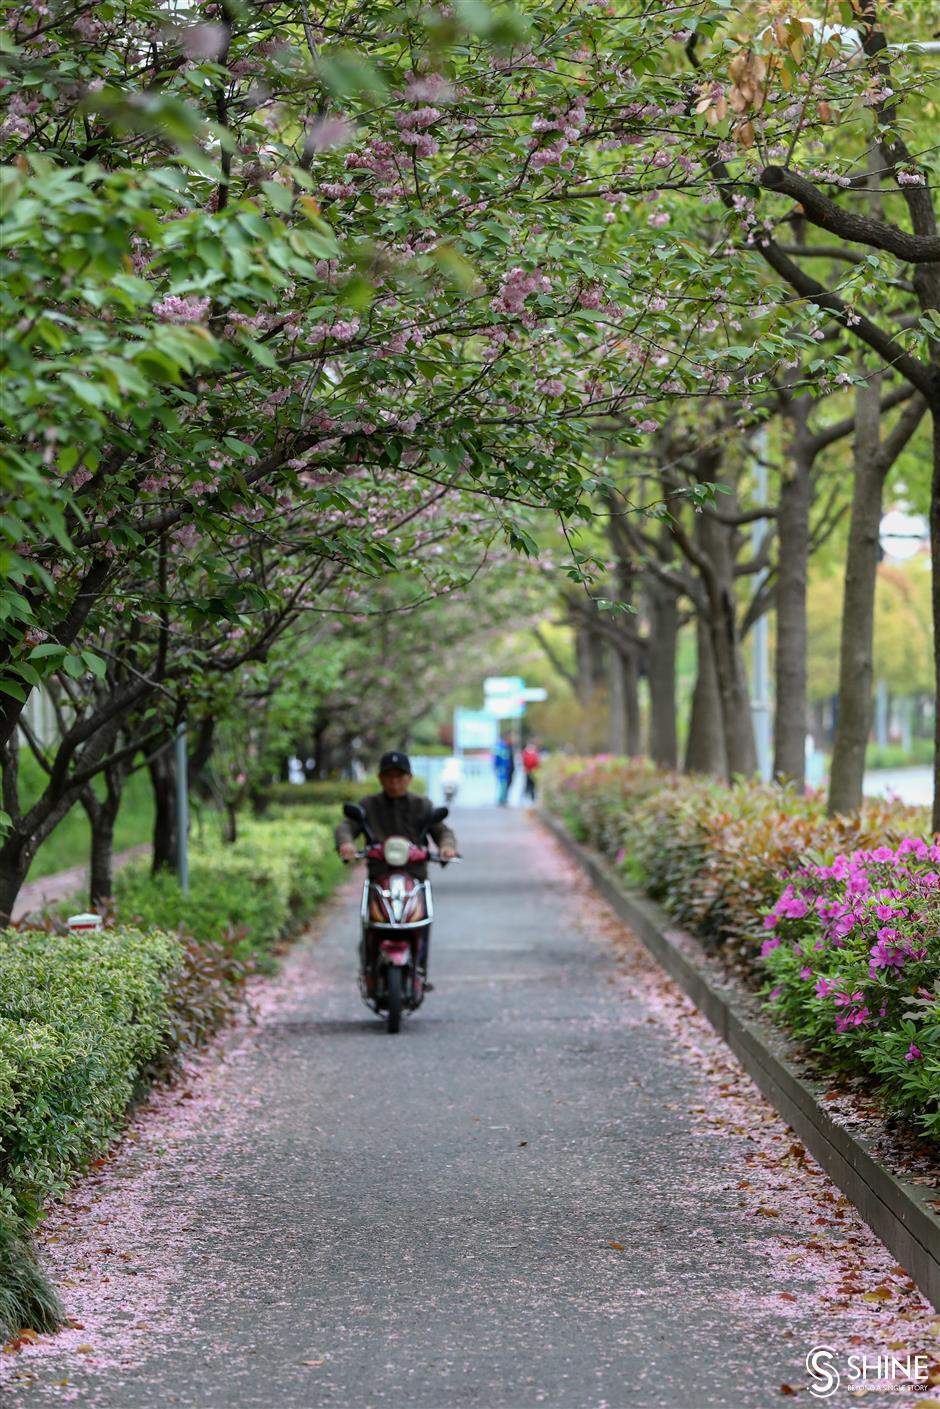 Cherry blossom left to beautify city roads